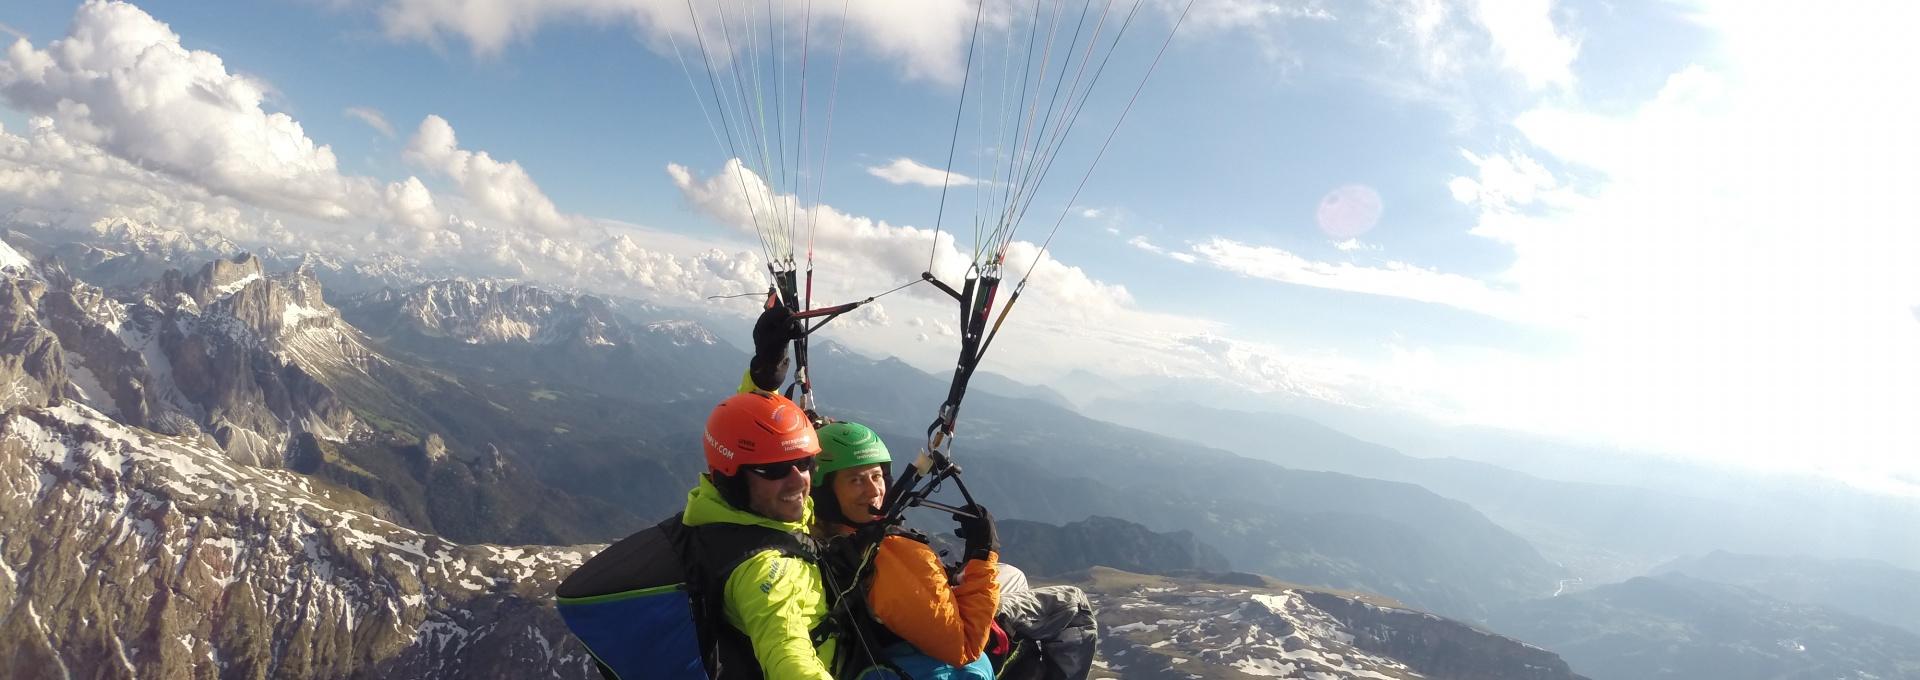 Alpe di Siusi paragliding